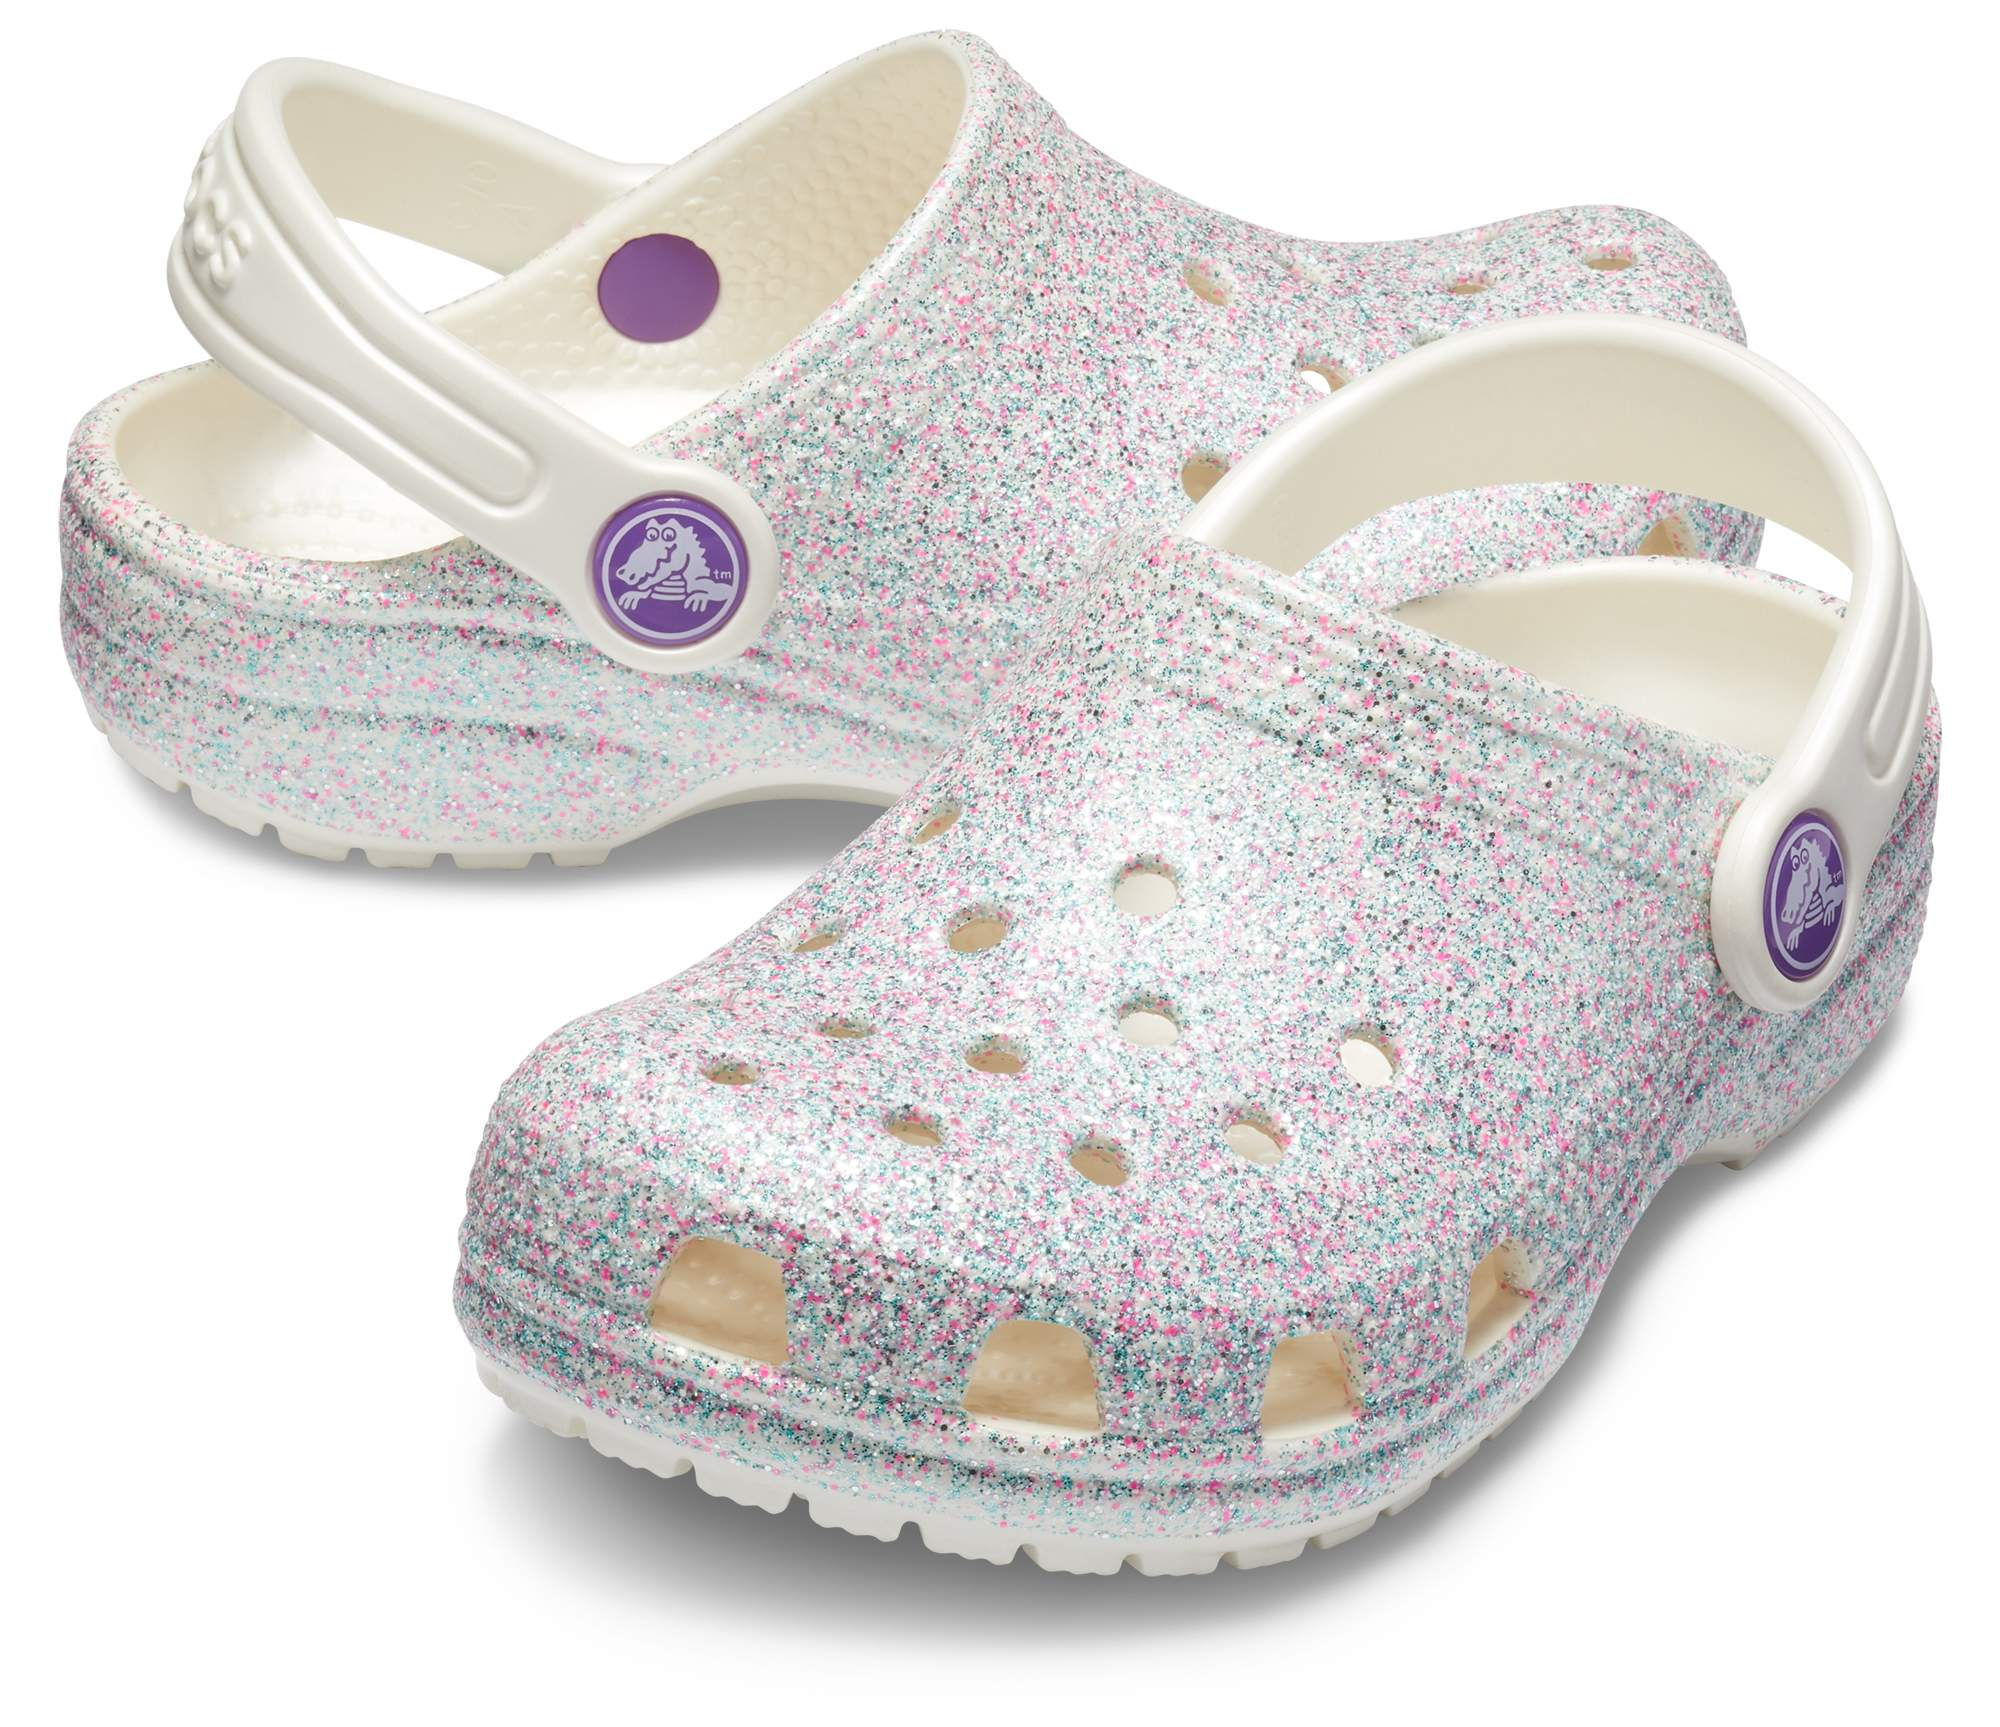 Sabots Femme Crocs Classic Glitter Clog K